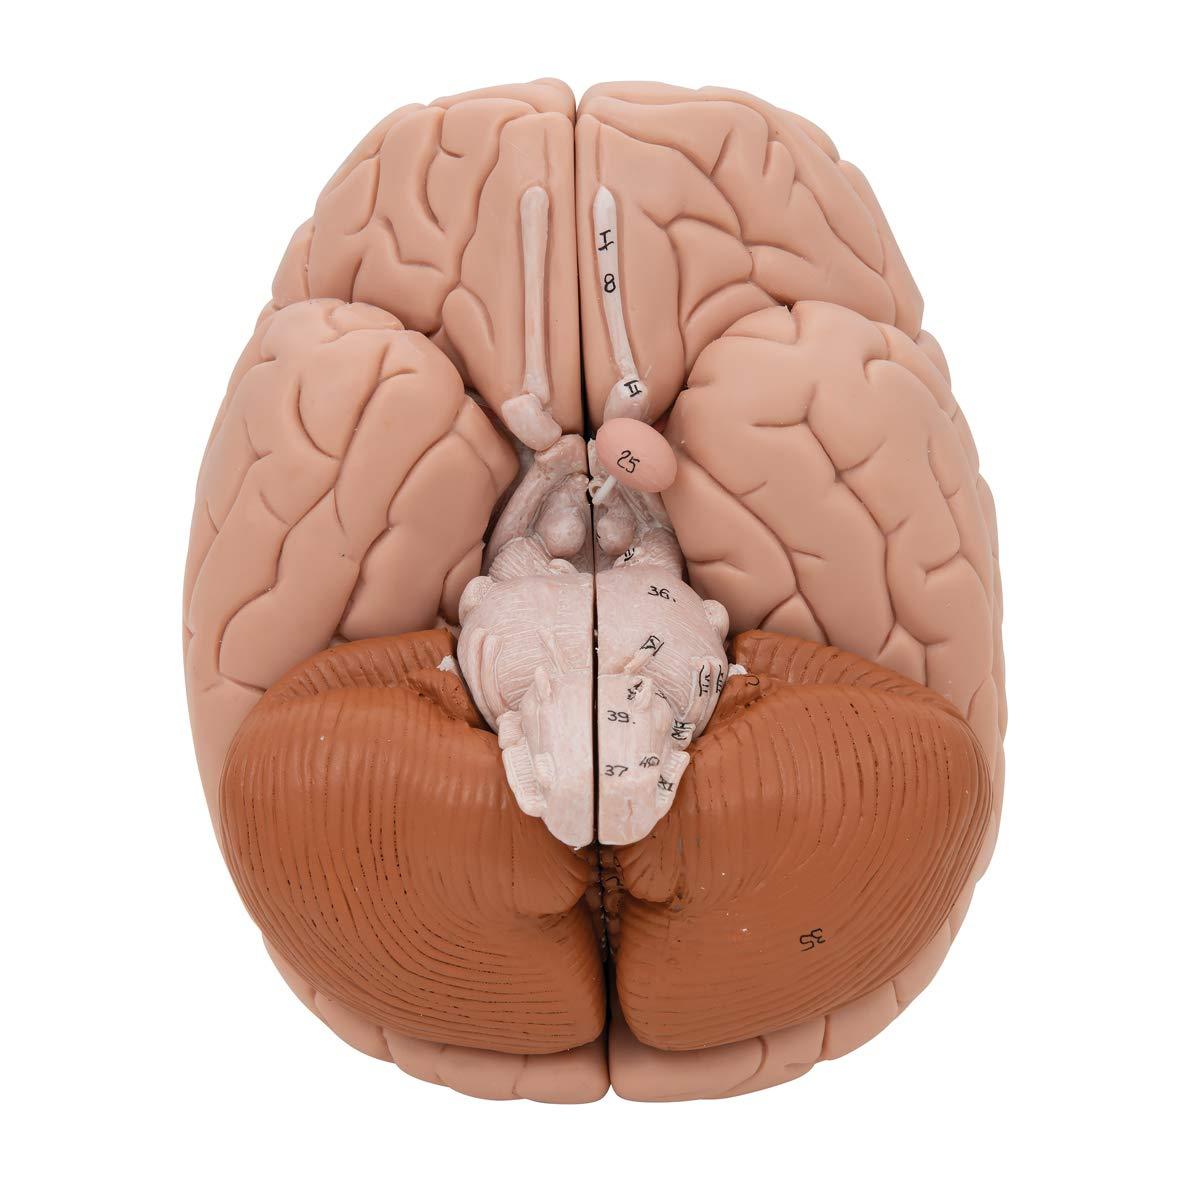 3B Scientific Deluxe 8-Part Brain by 3B Scientific (Image #8)